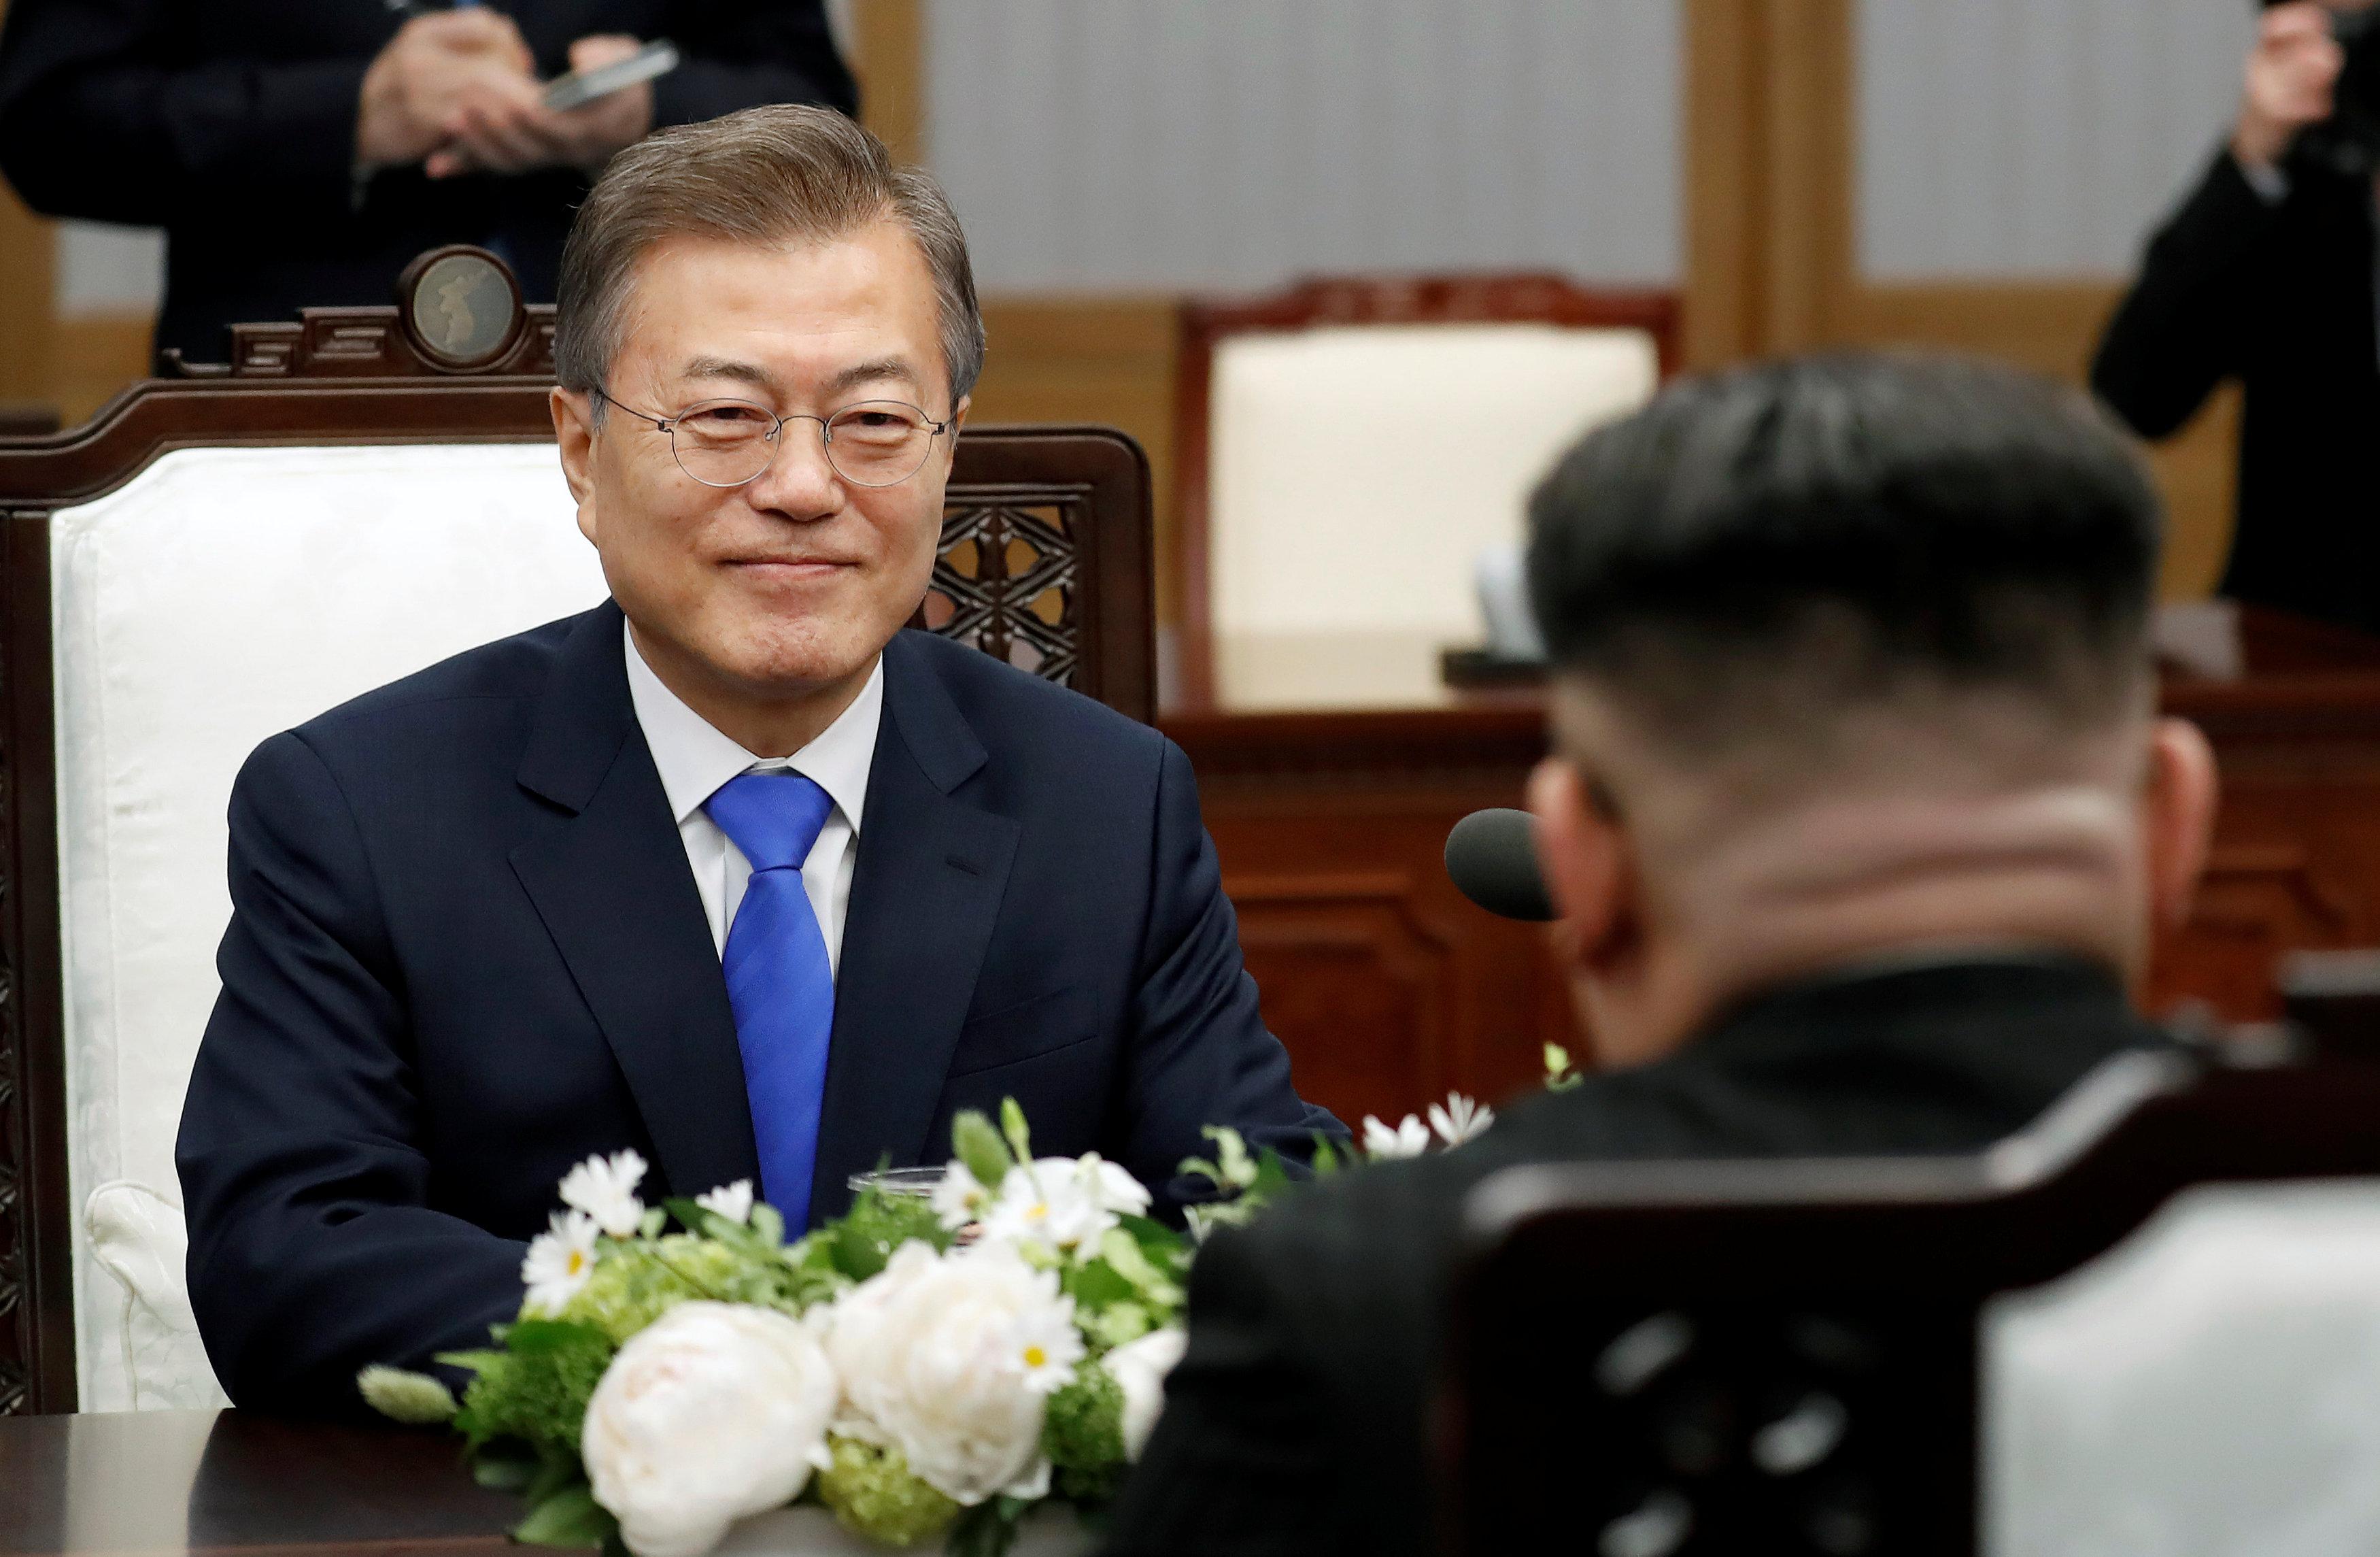 Los dos líderes, cara a cara. Korea Summit Press Pool/Pool via Reuters